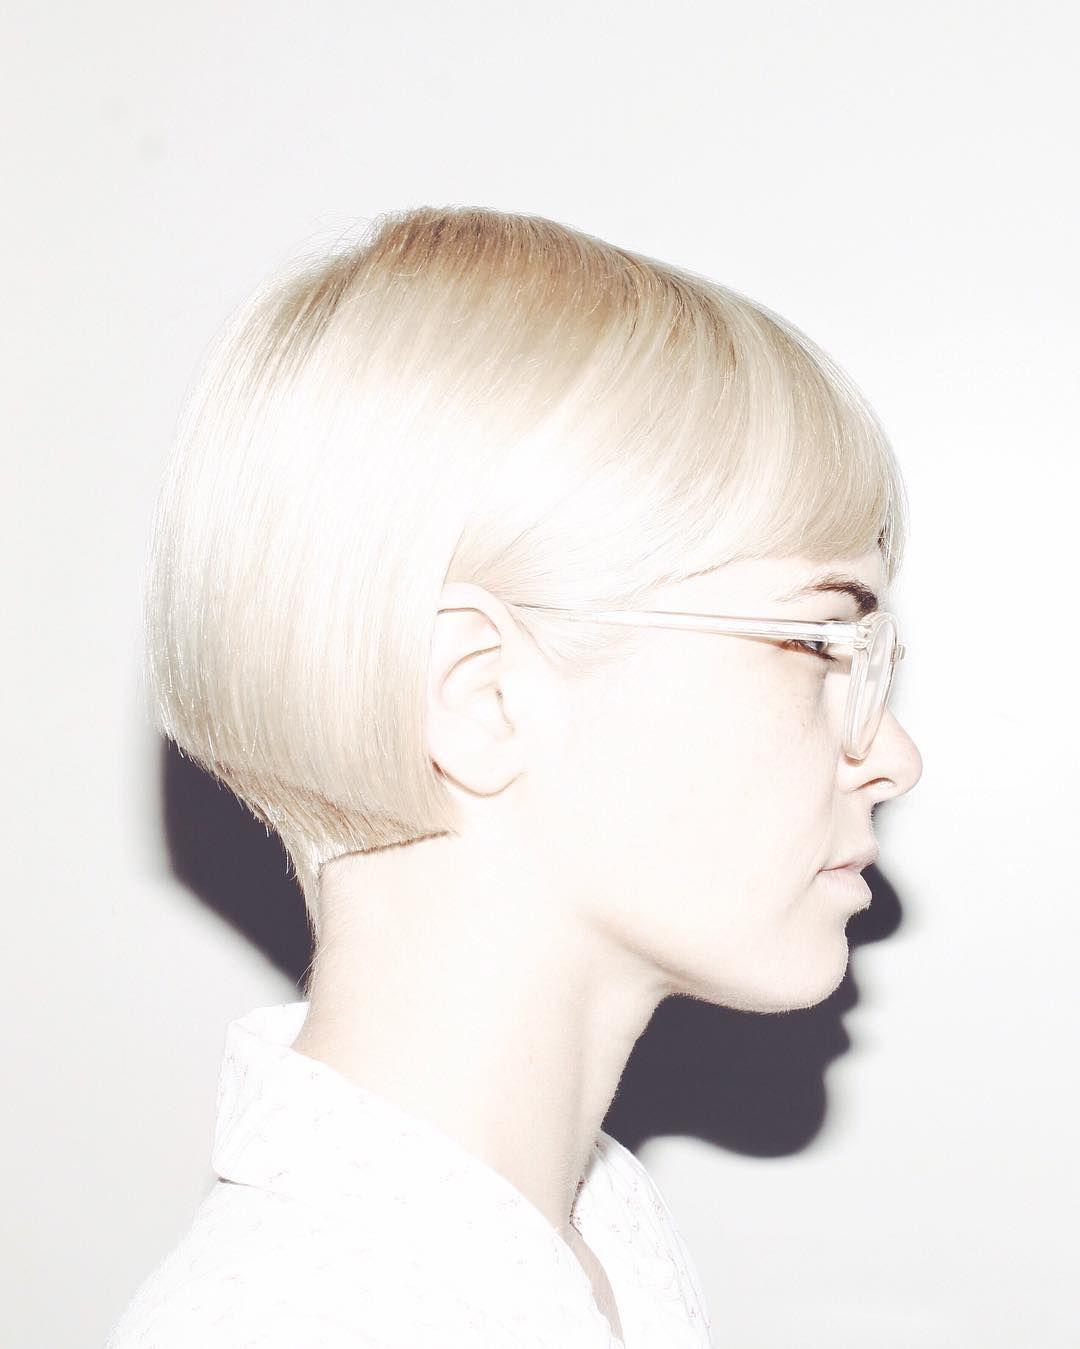 blond bob haircut idea for girls | Short Hairstyles for Women ...